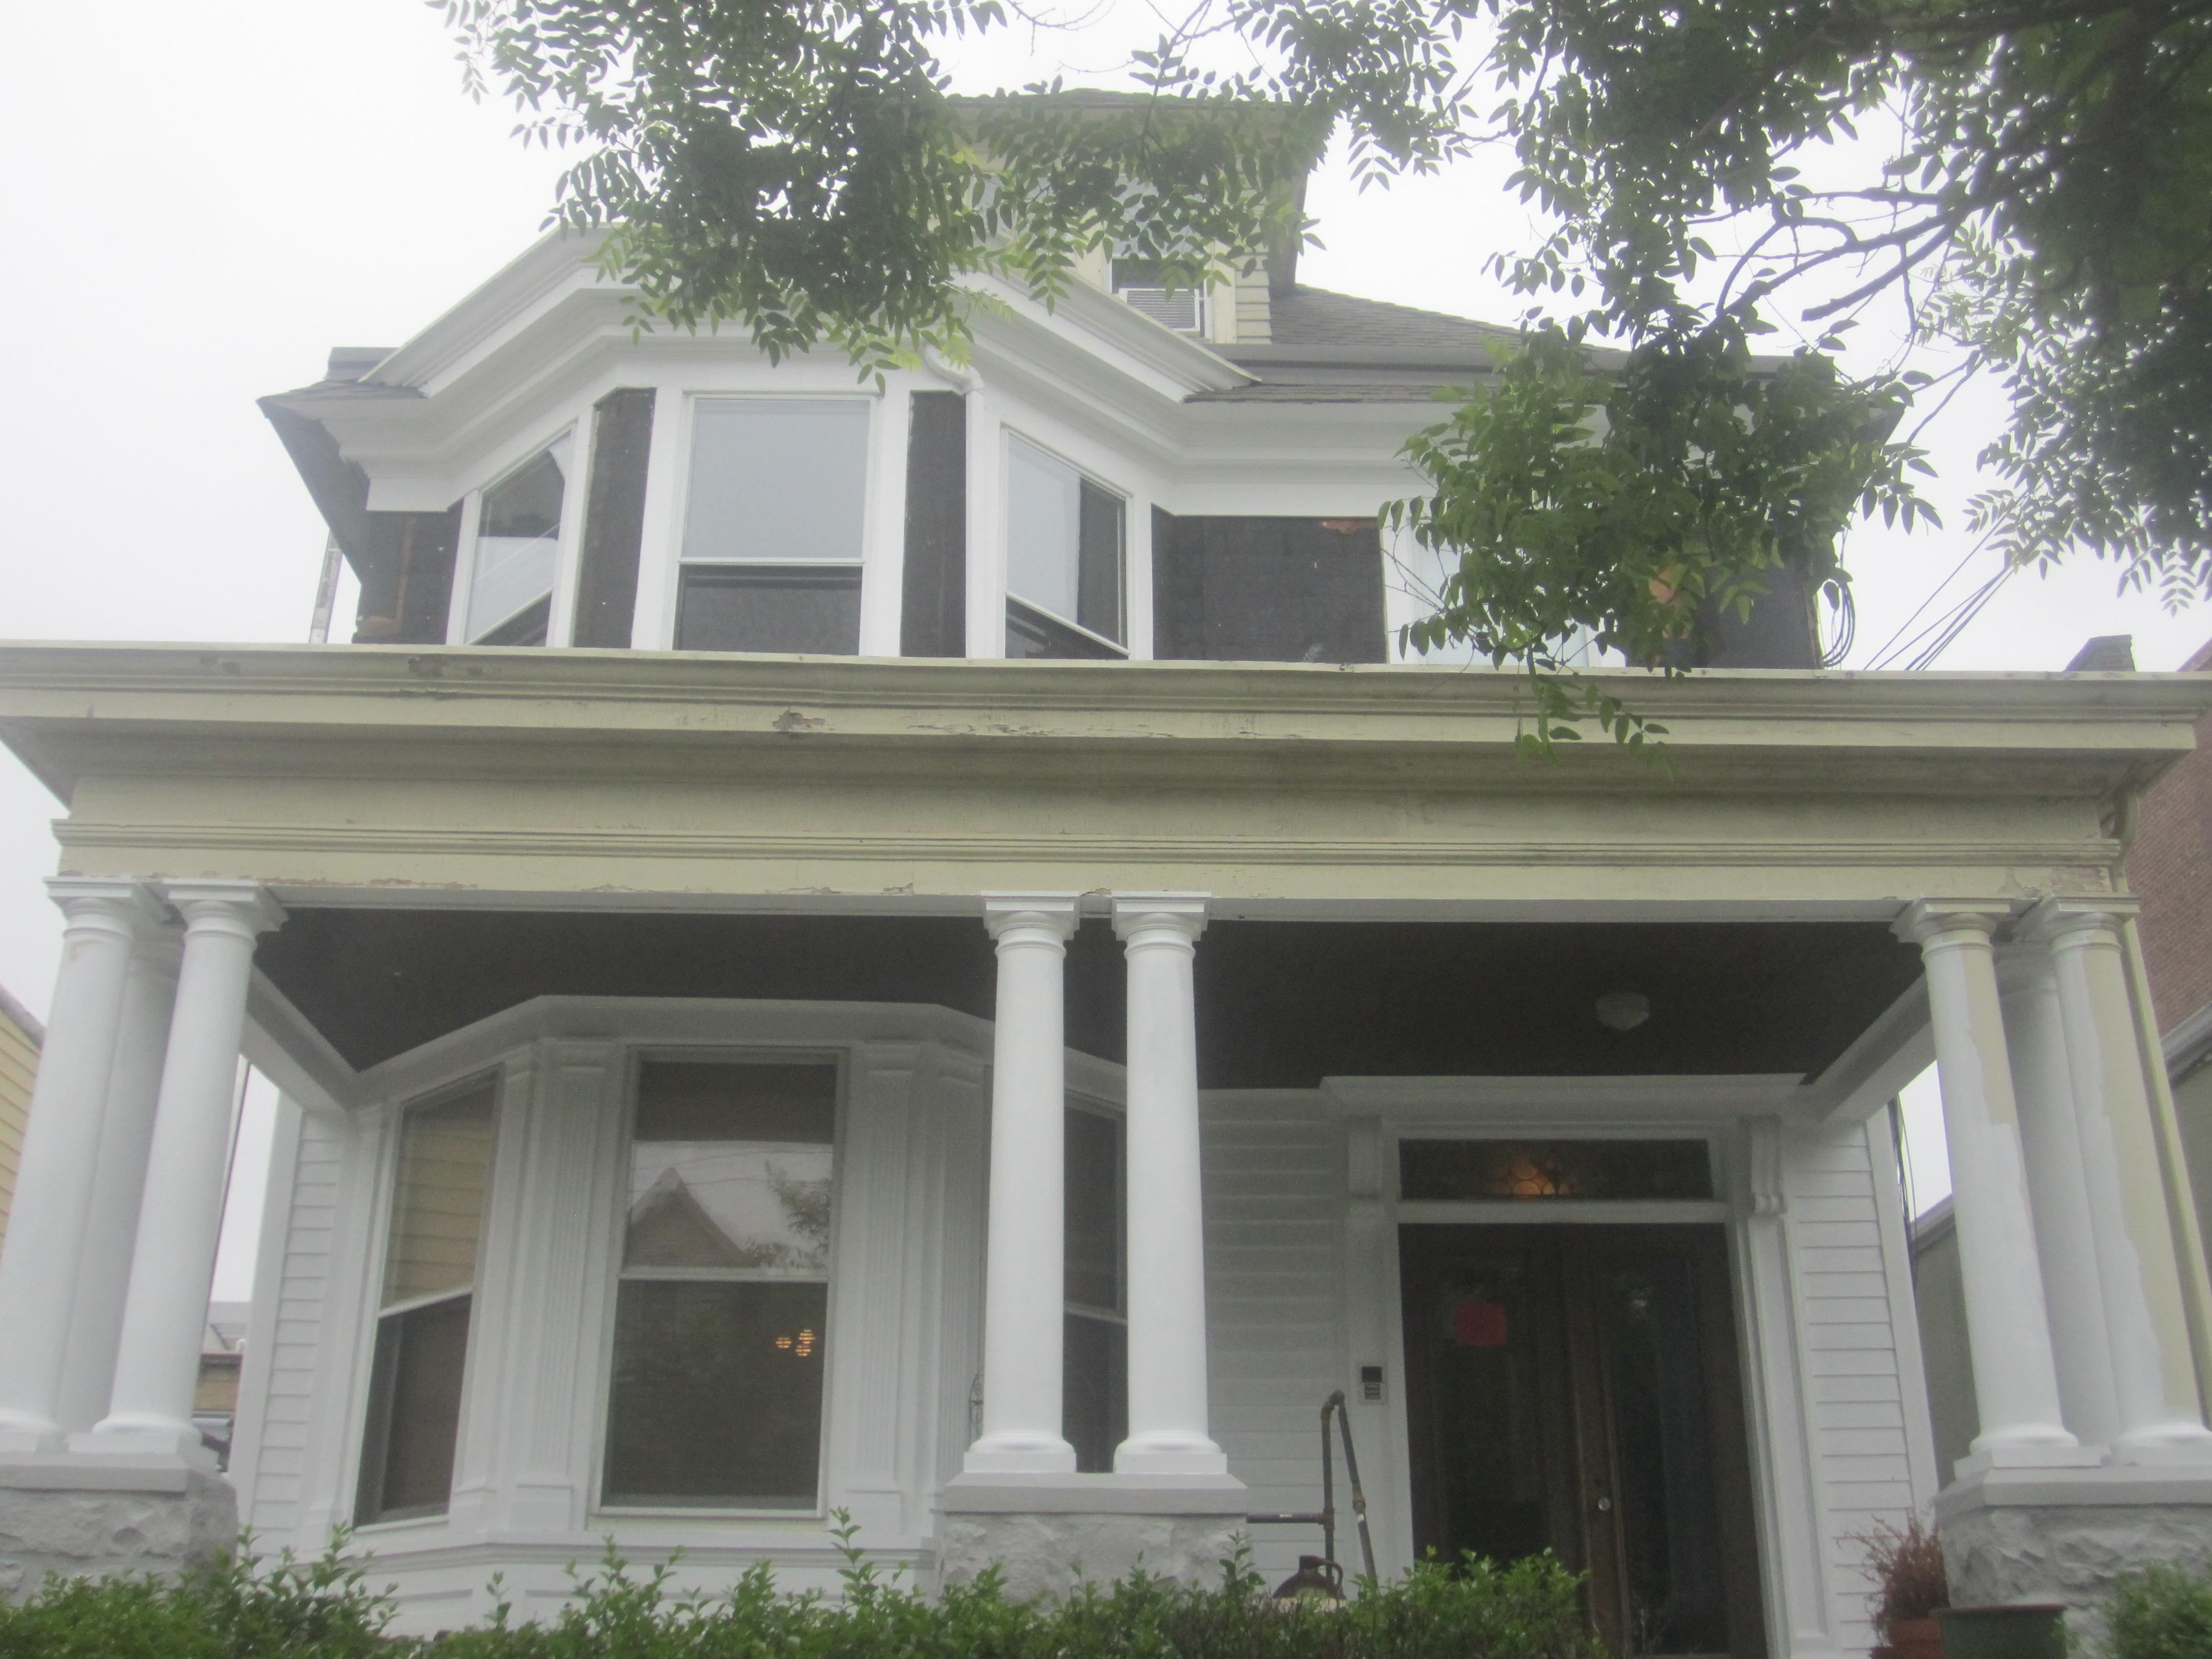 Vinyl Siding Price For Colonial House In Nj Nj Discount